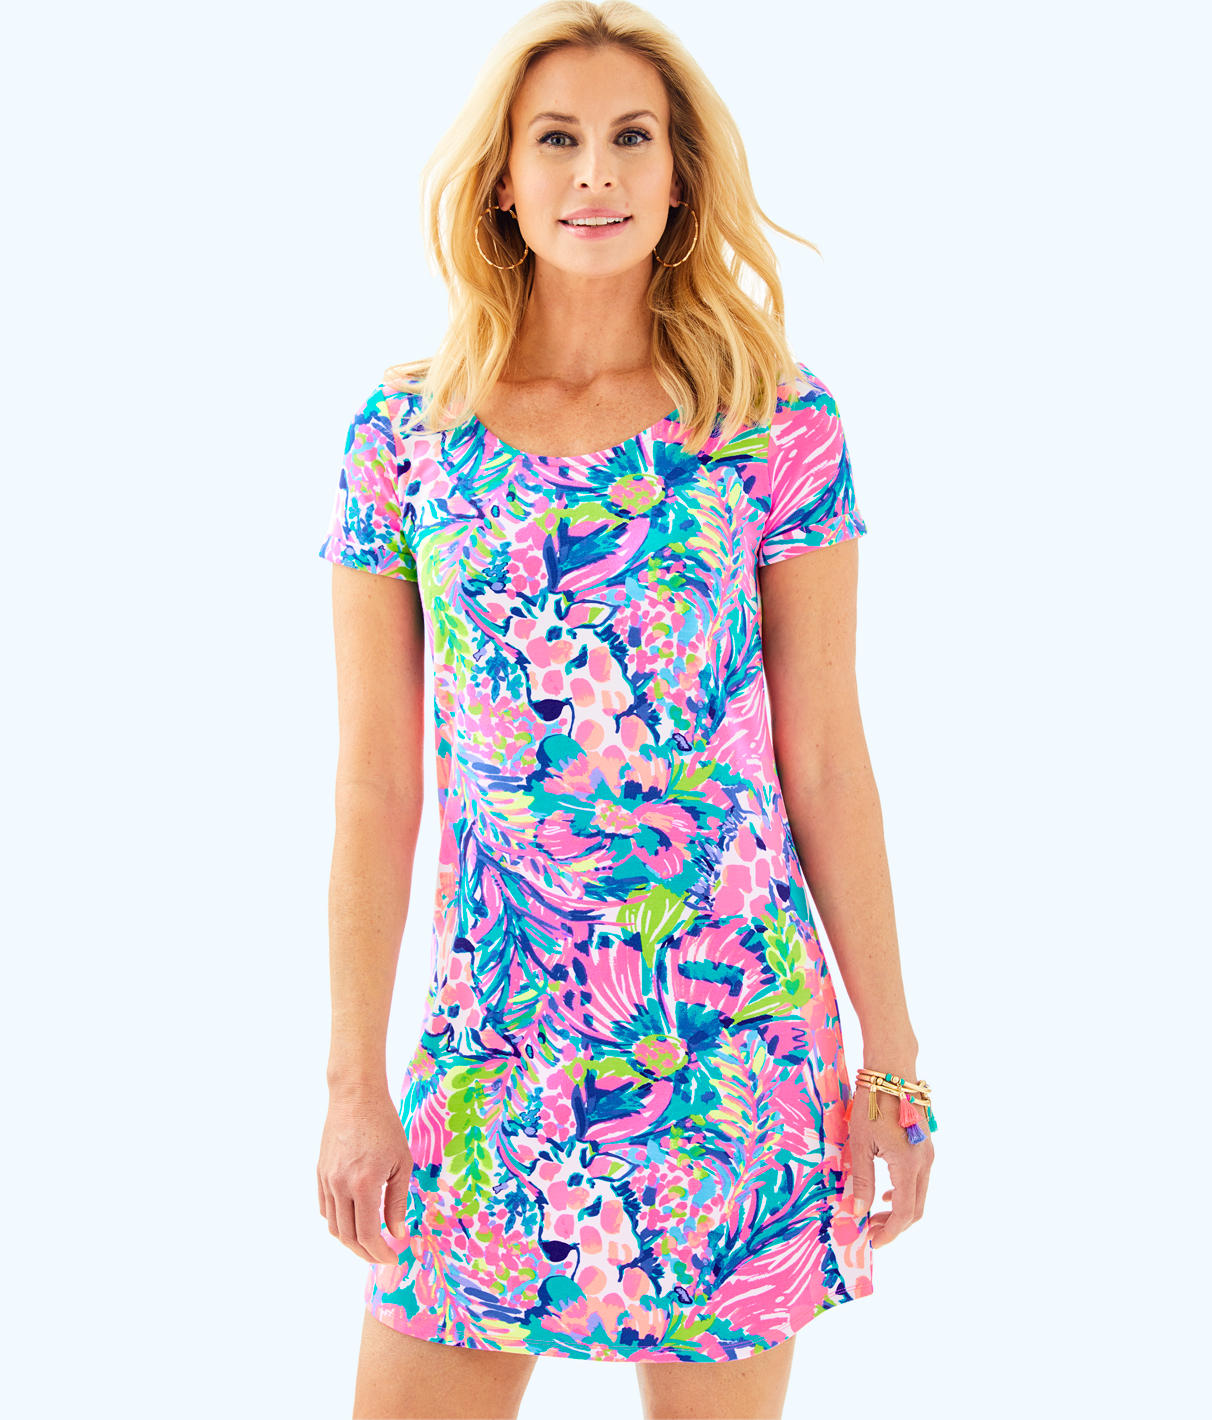 Lilly Pulitzer Lilly Pulitzer Womens UPF 50+ Tammy Dress